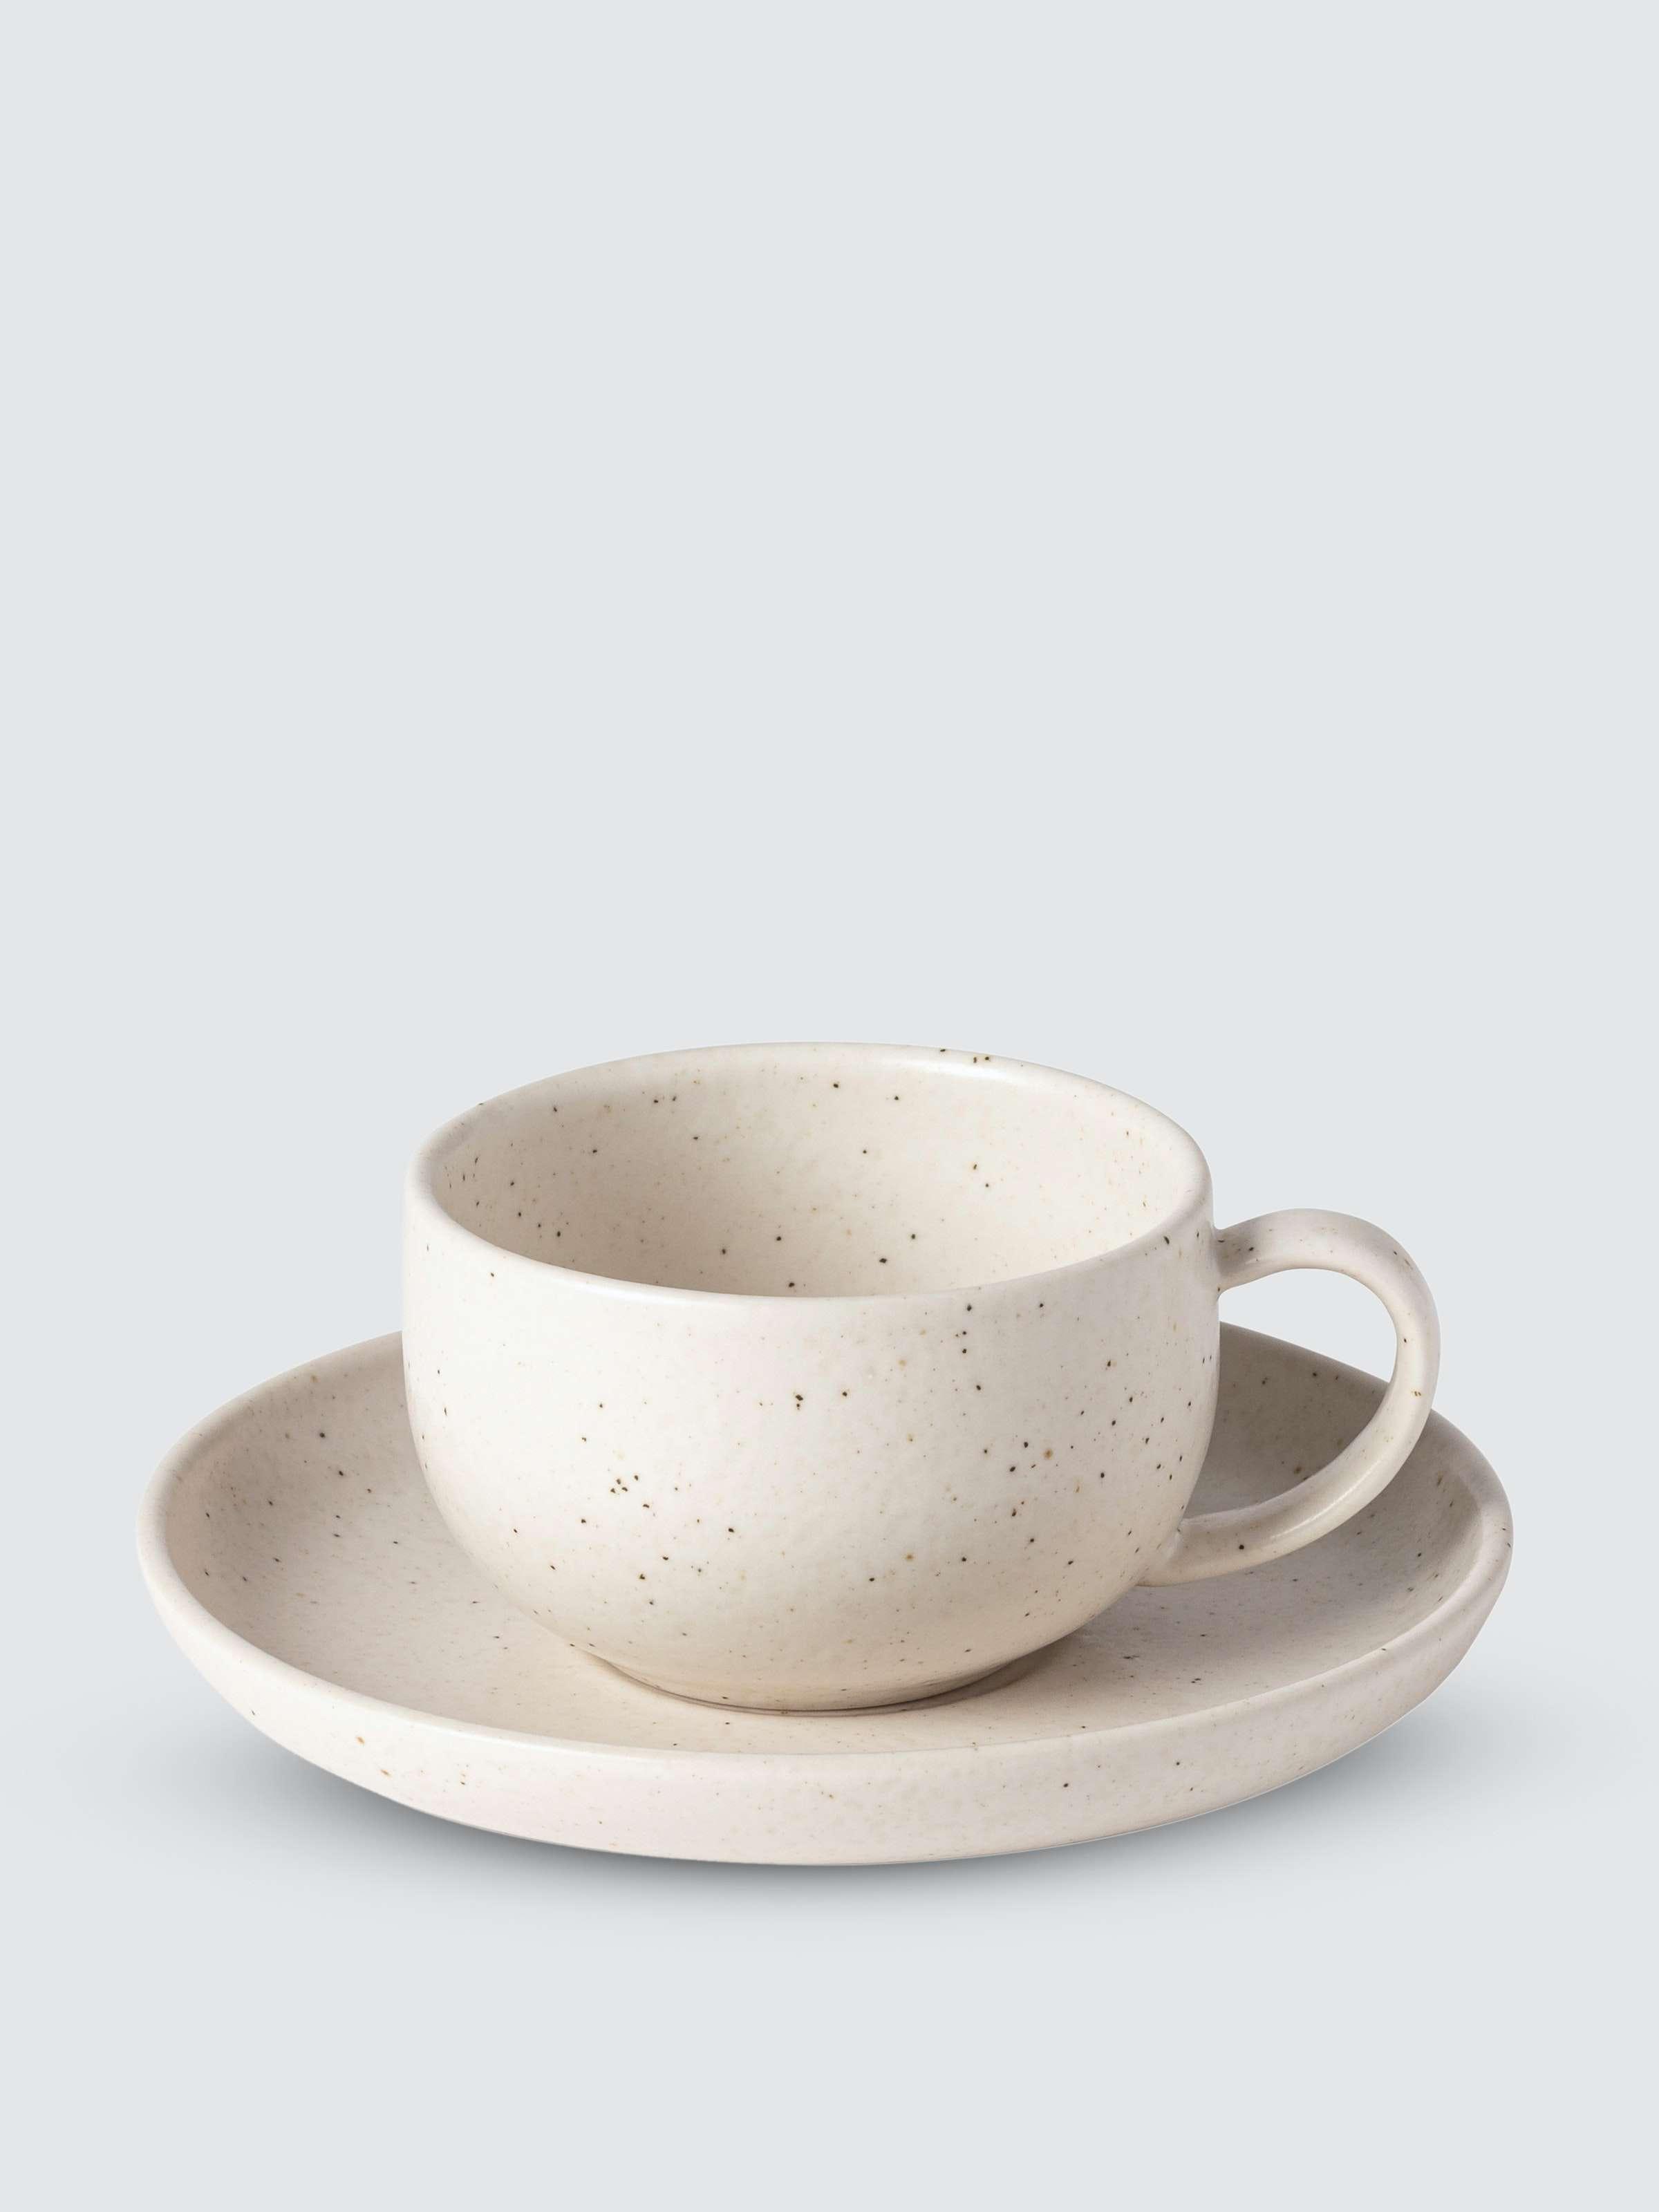 casafina-pacifica-tea-cup-saucer